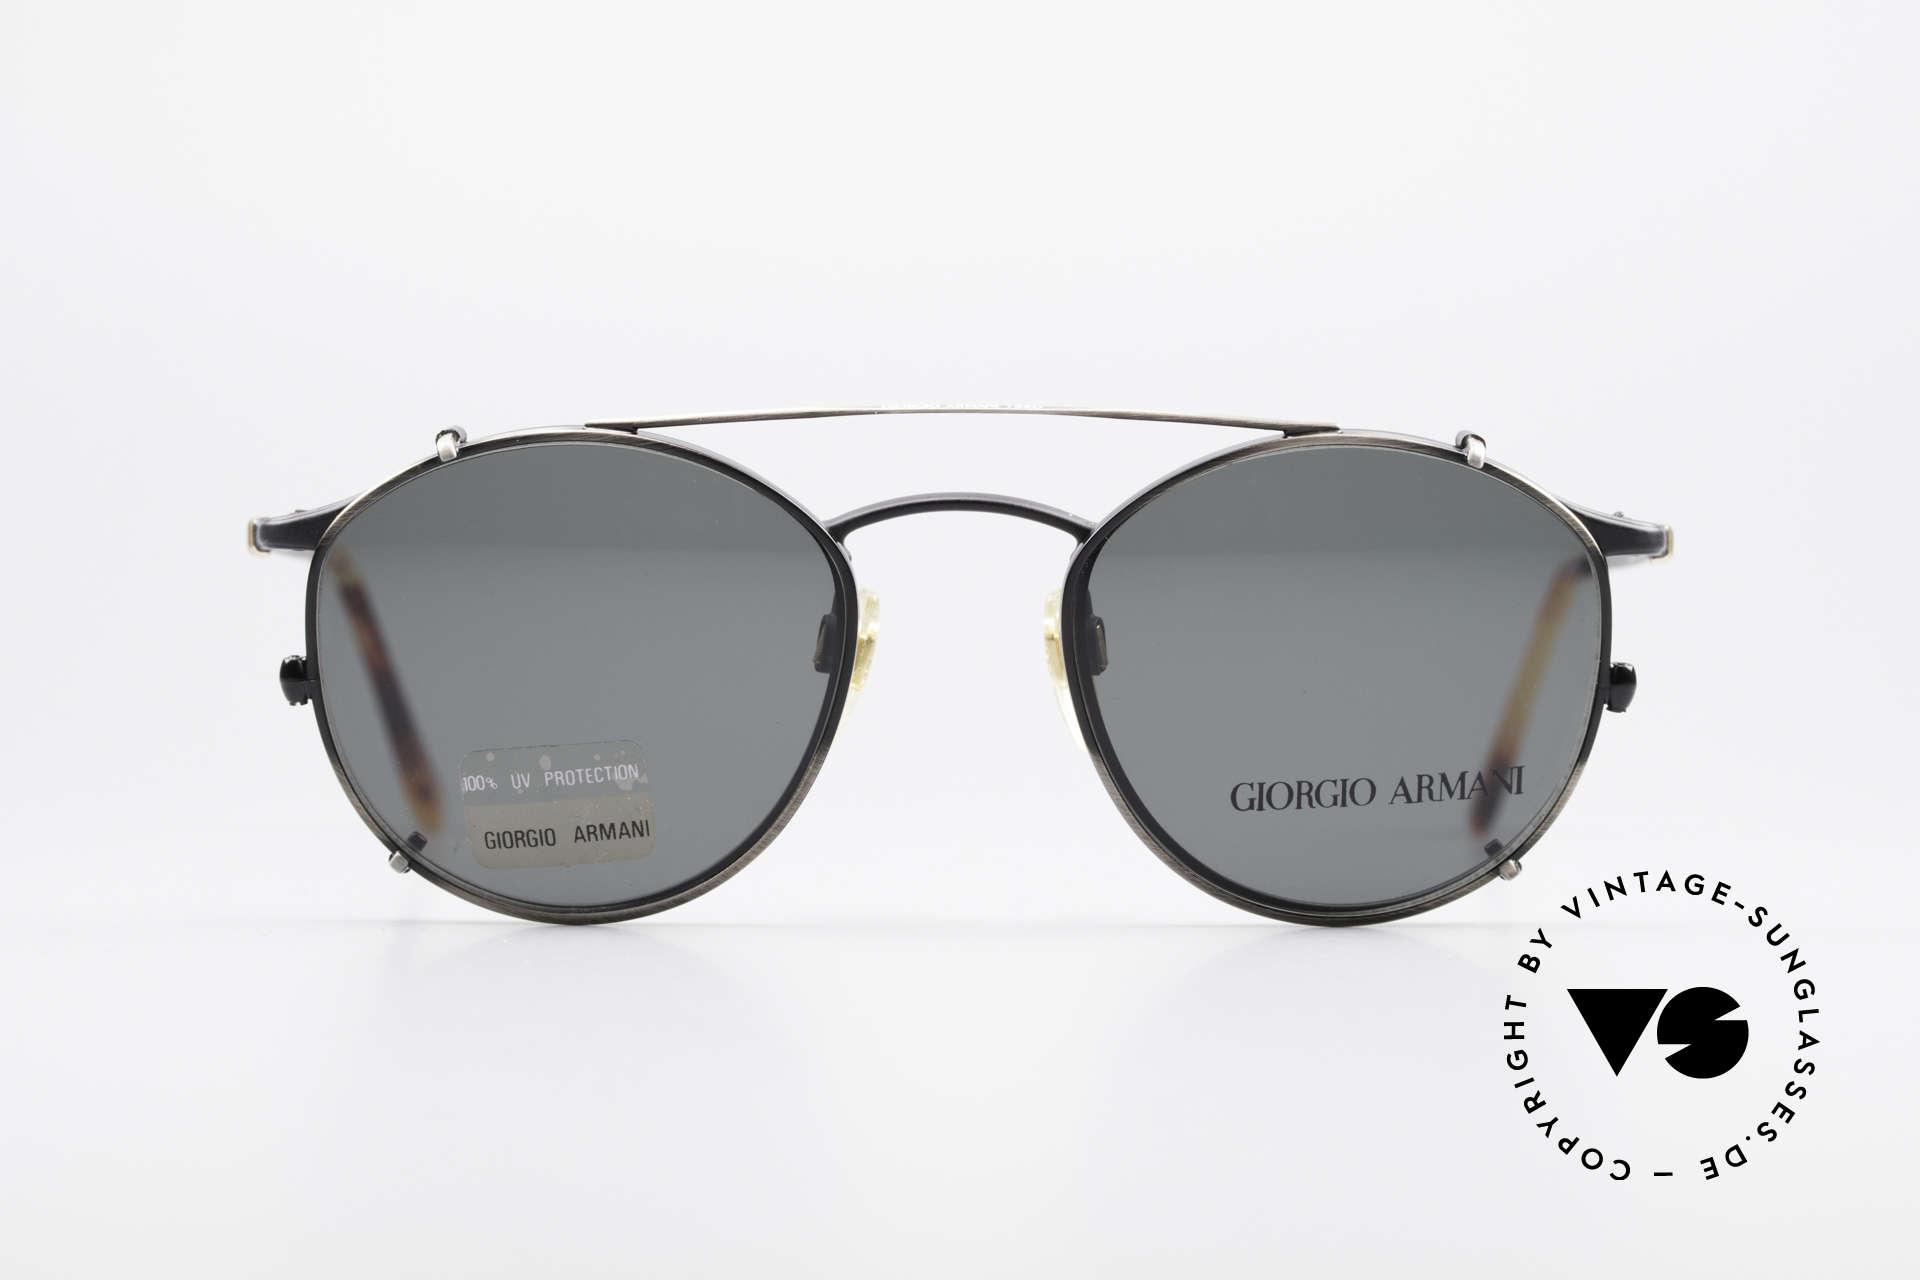 269798b0308c Sunglasses Giorgio Armani 132 Clip On Panto Eyeglasses